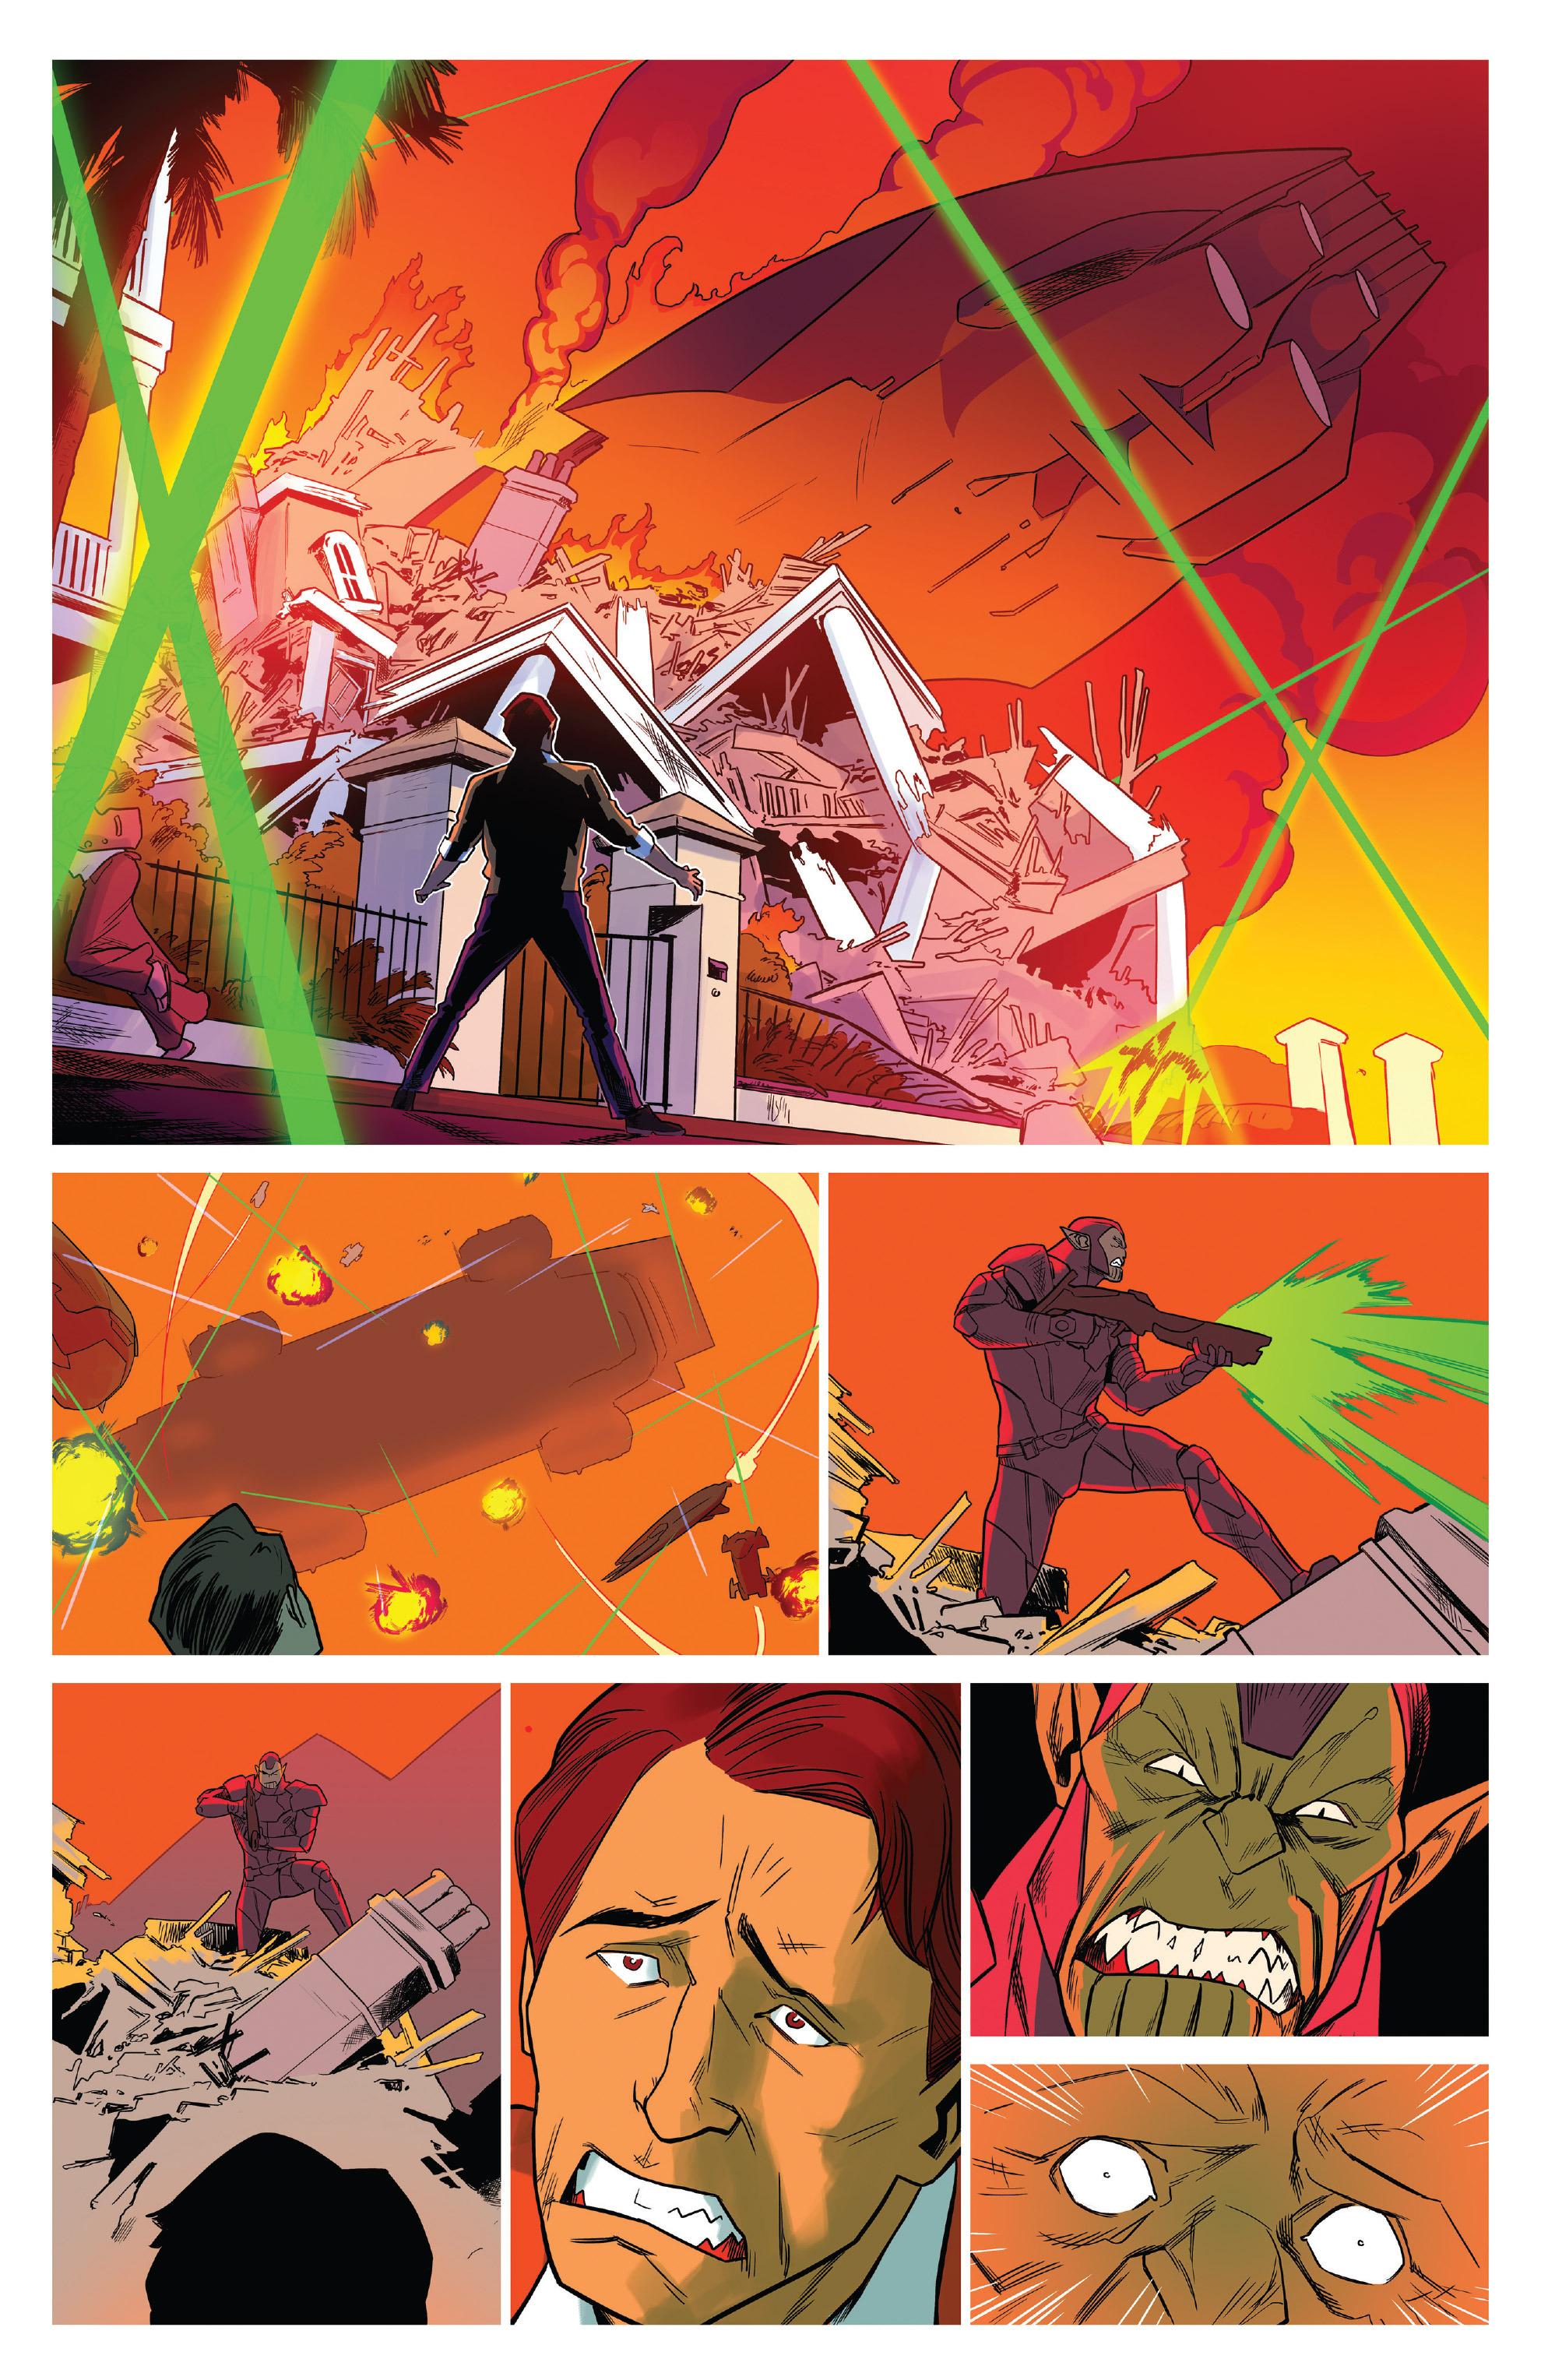 Read online Uncanny X-Men (2013) comic -  Issue # _TPB 4 - vs. S.H.I.E.L.D - 83